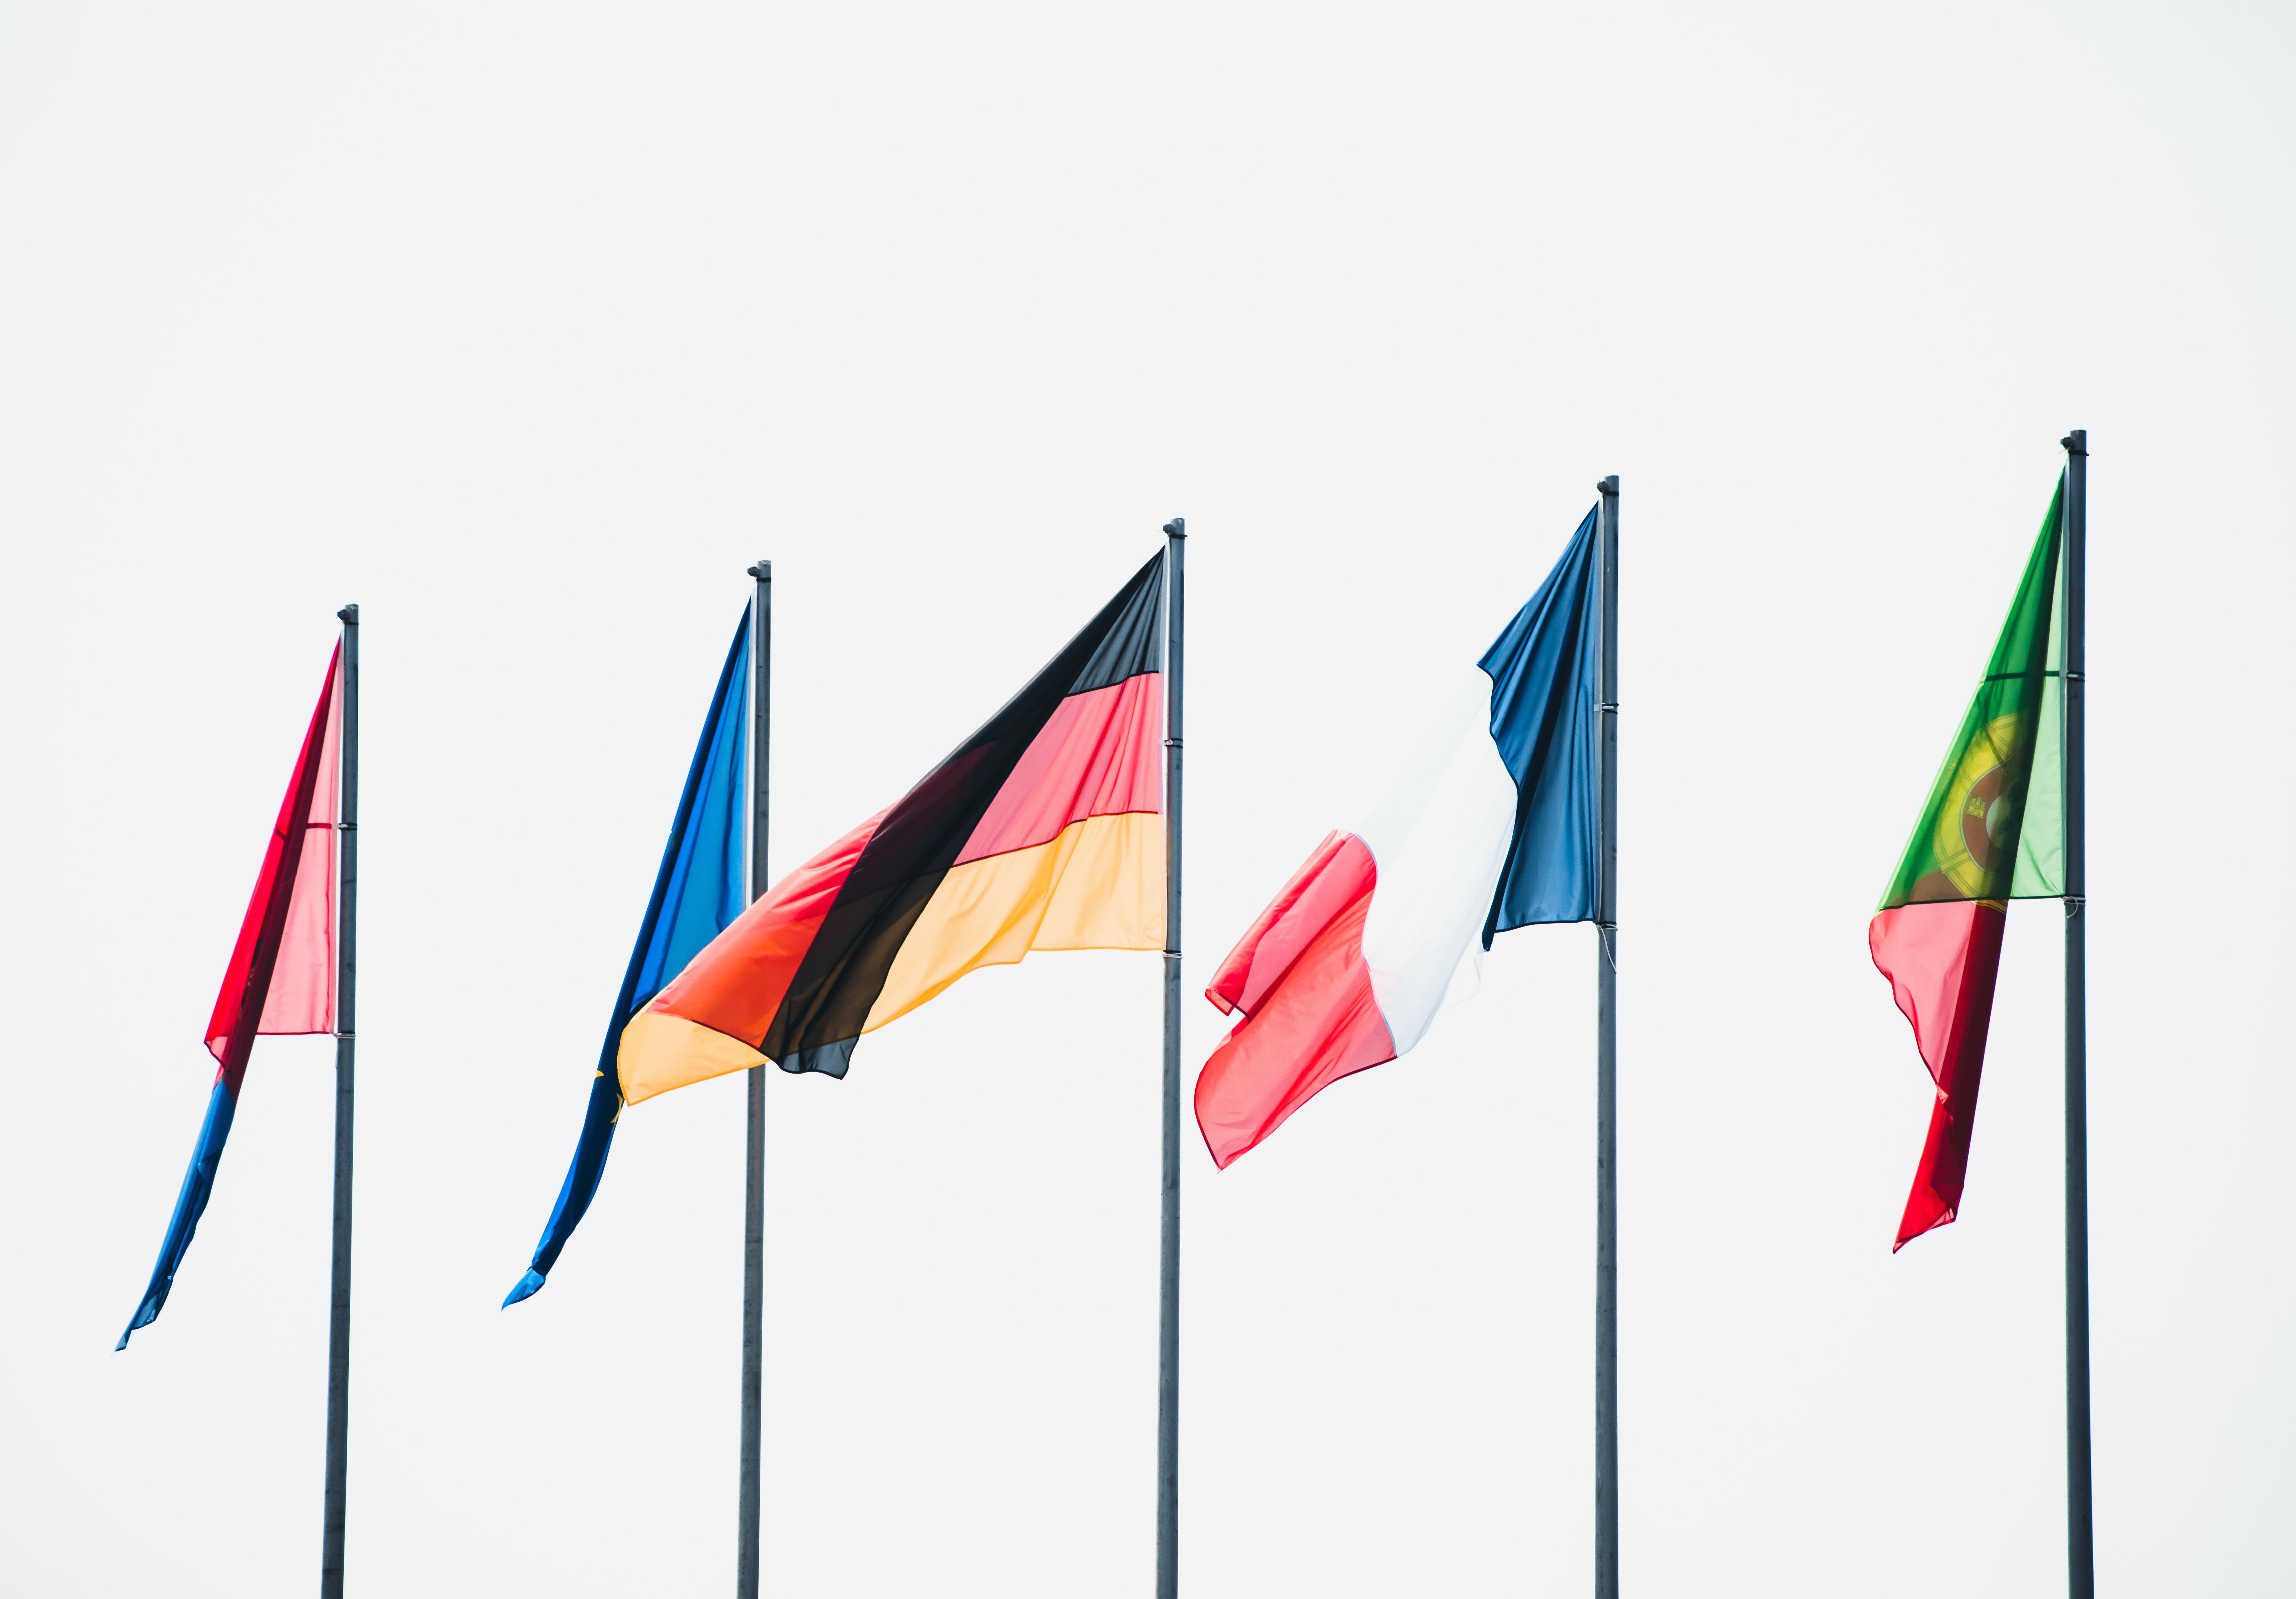 L'Europe sortira plus forte de la crise